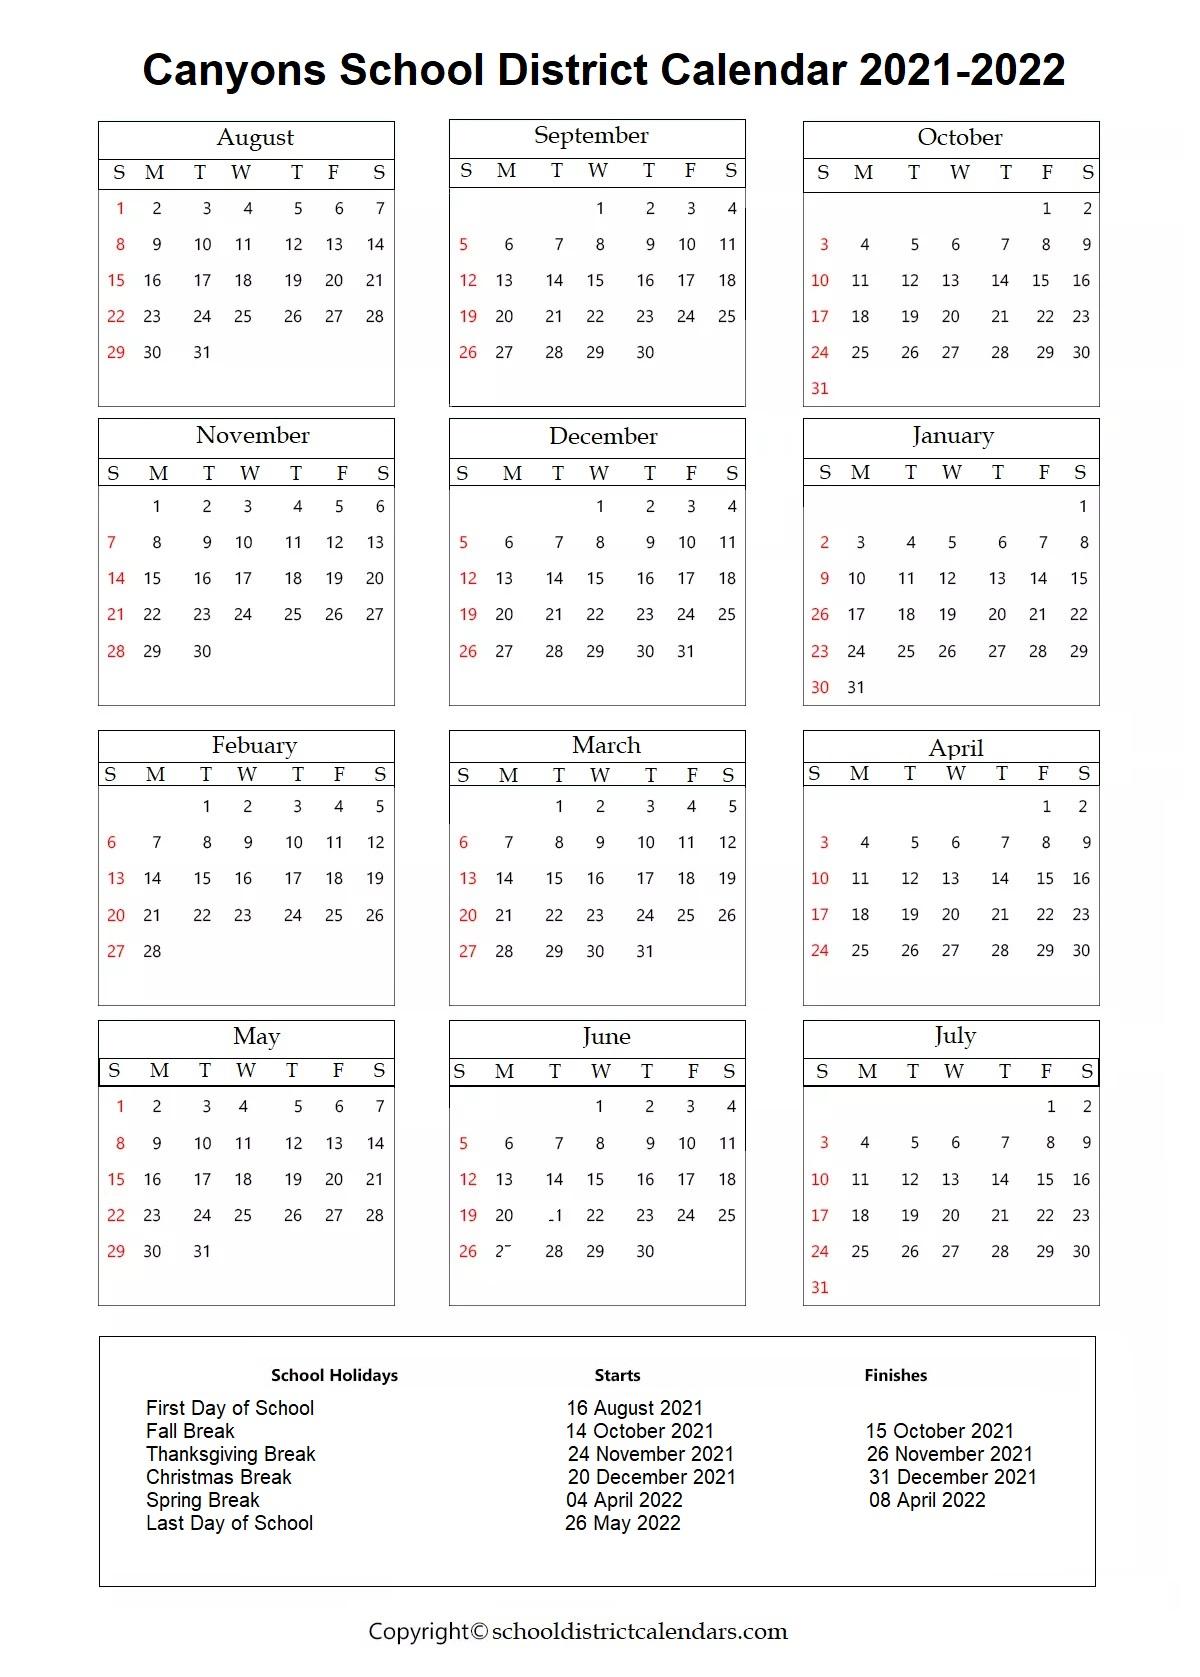 Canyons School District, Utah Calendar Holidays 2021-2022